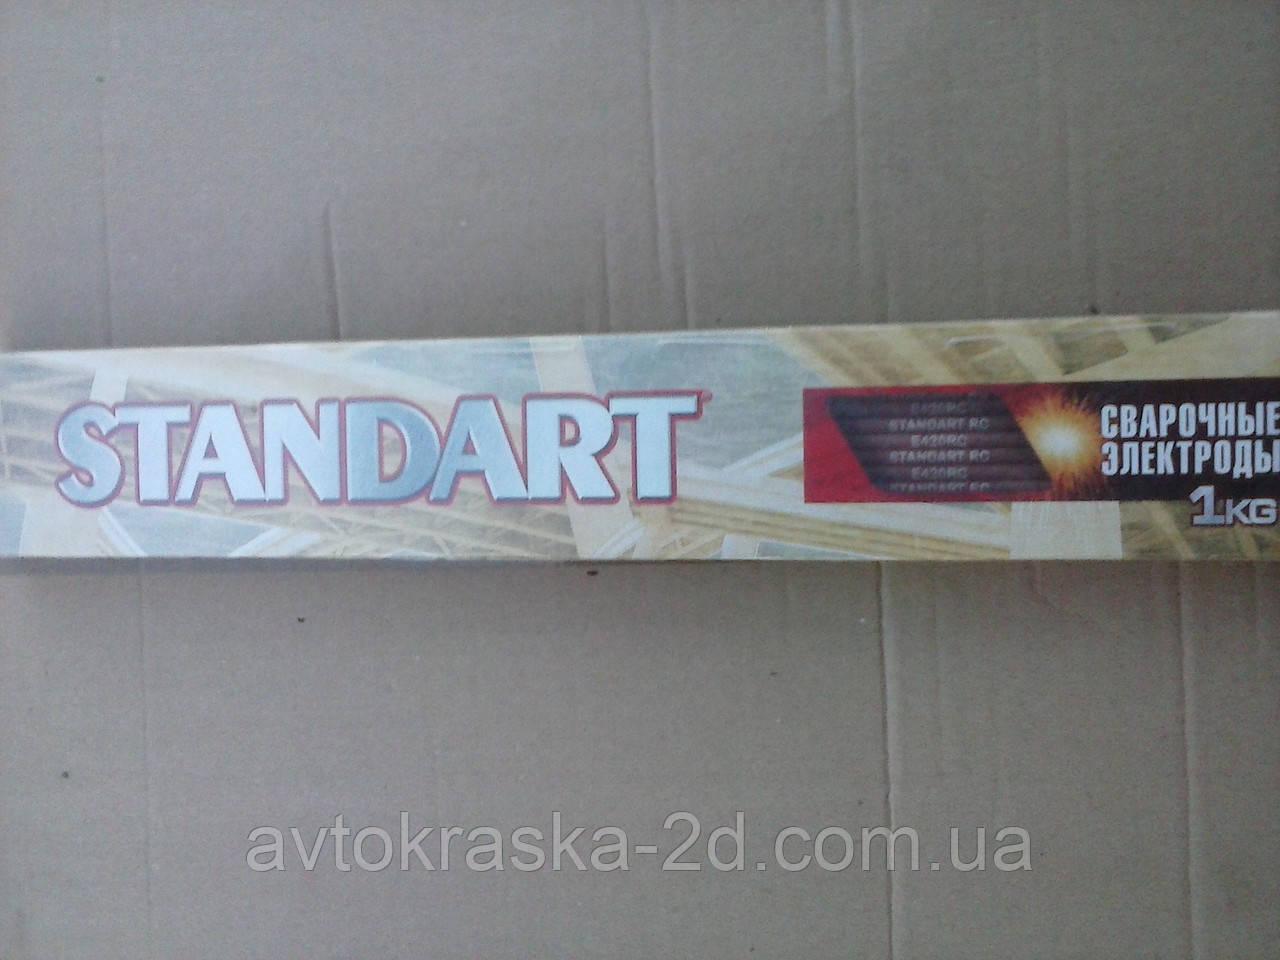 Электроды Стандарт РЦ 3 мм 1 кг.